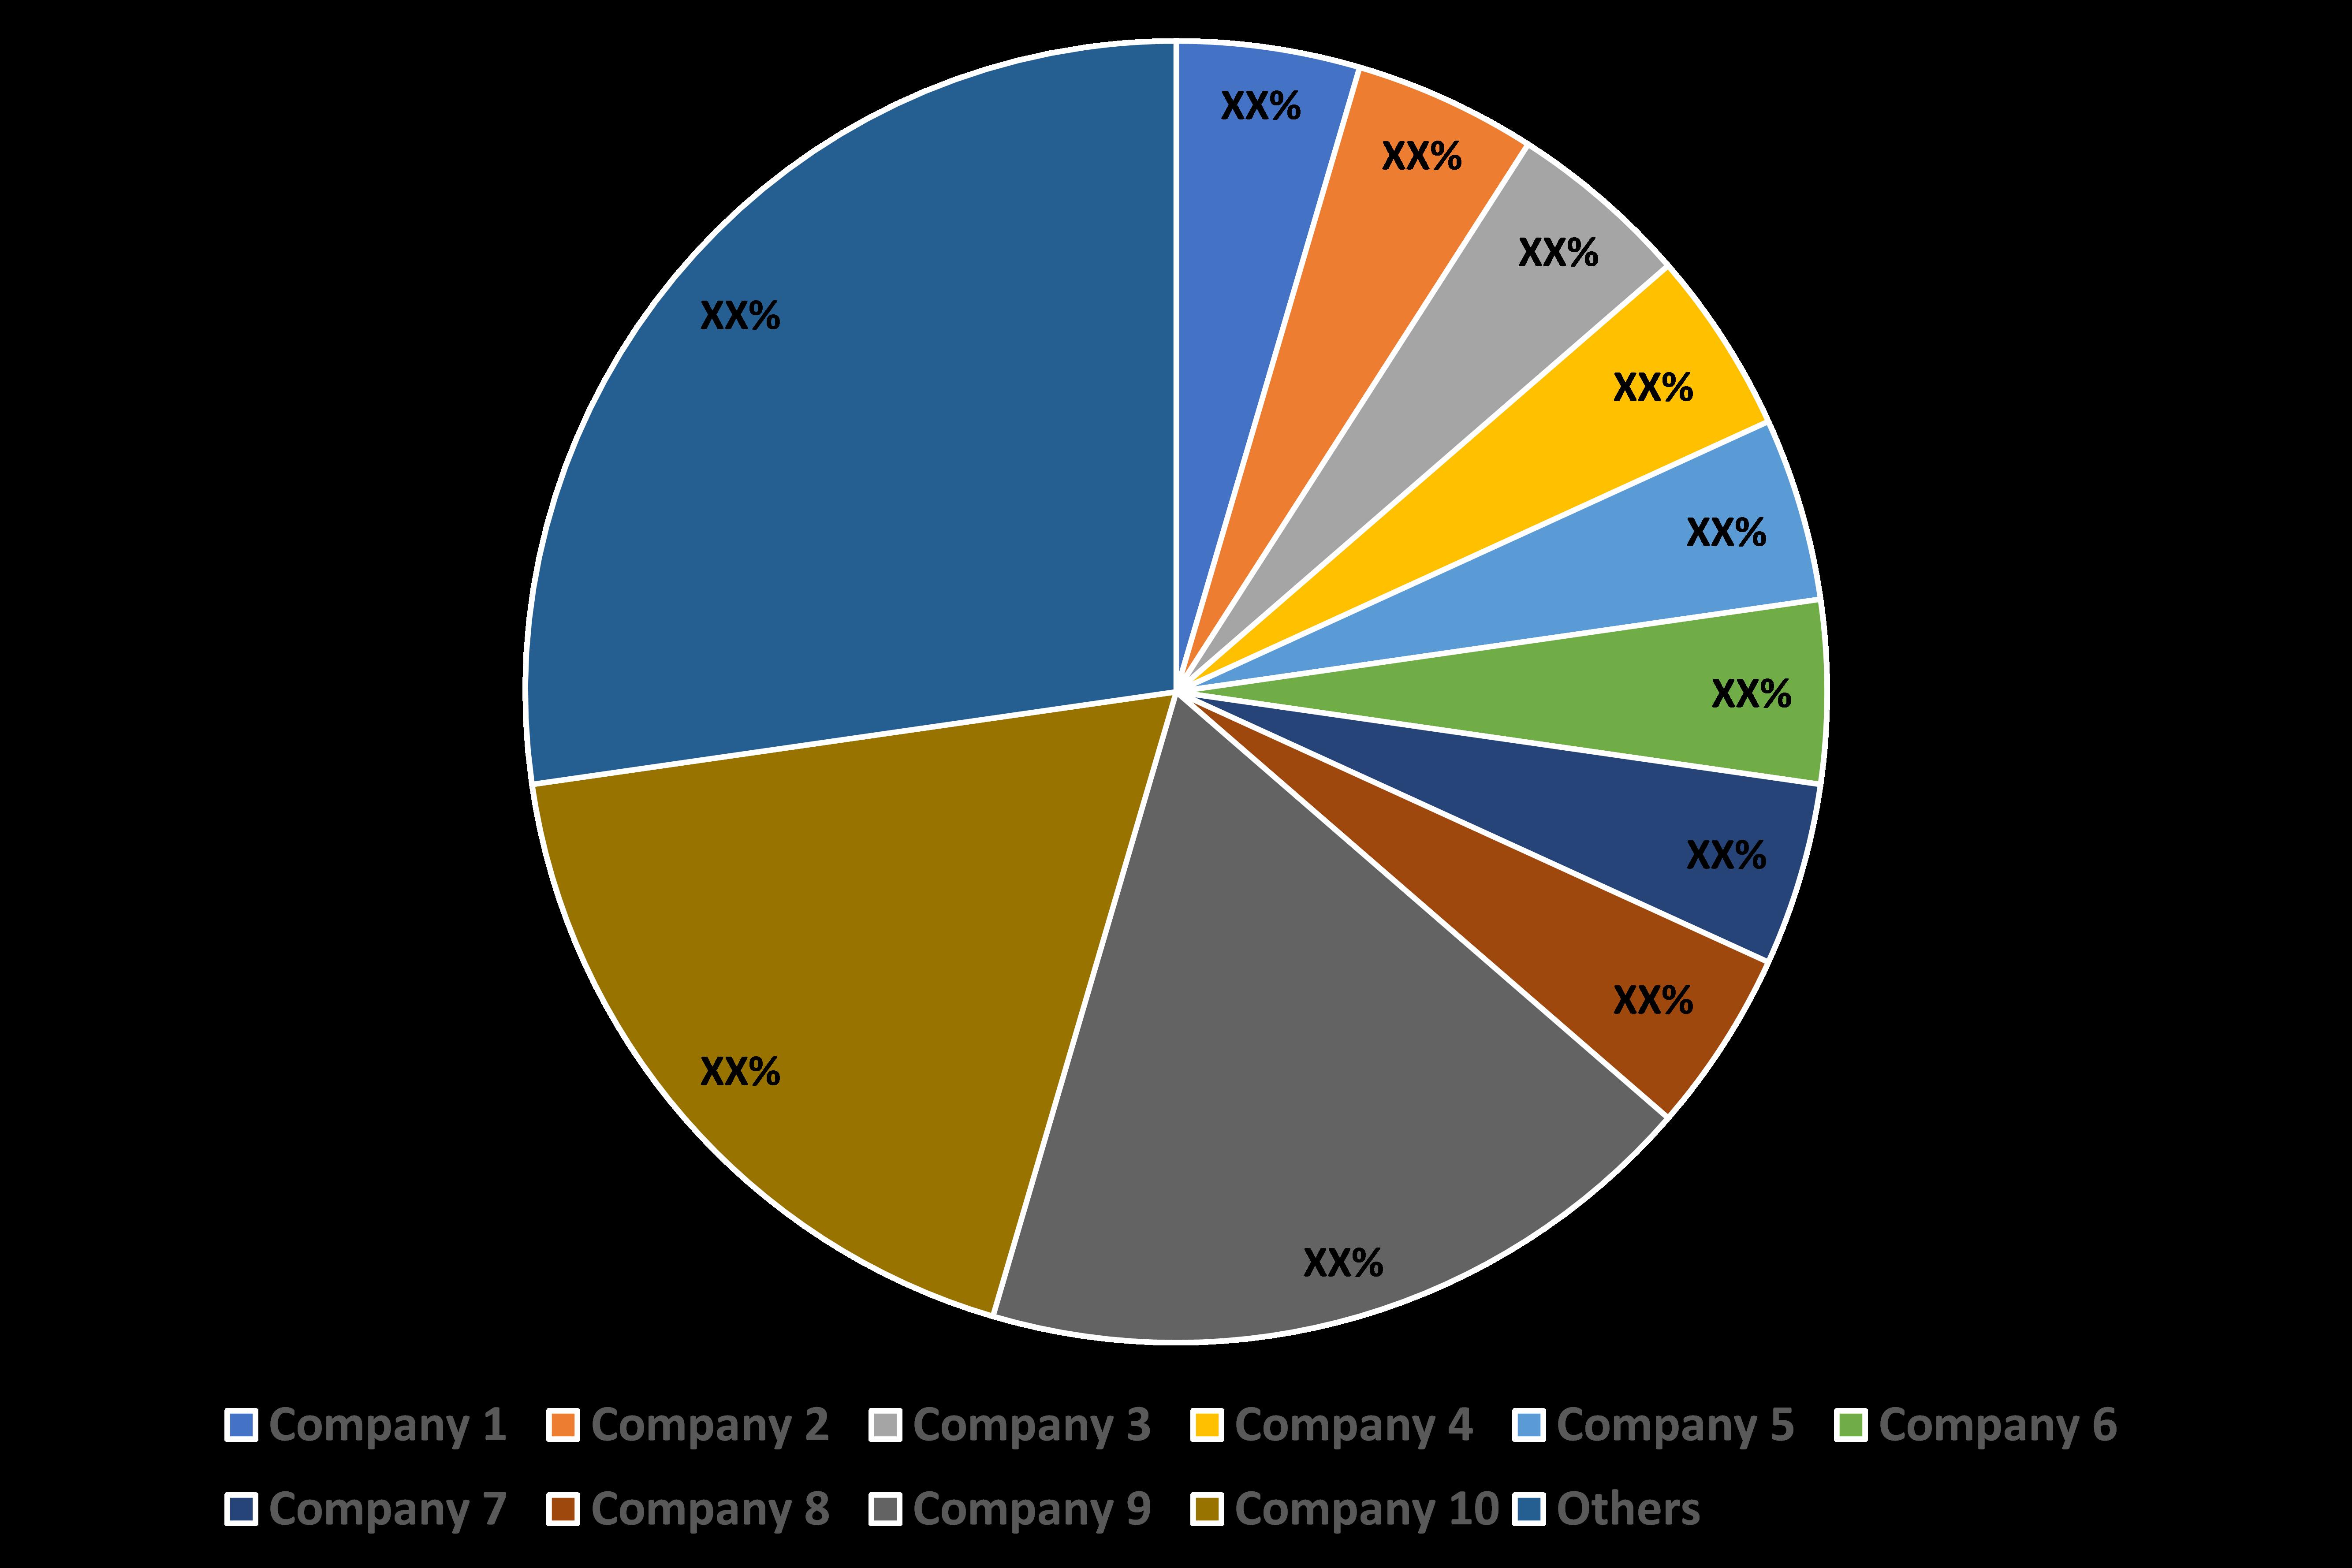 Global Friction Stir Welding Equipment Market By Manufacturers